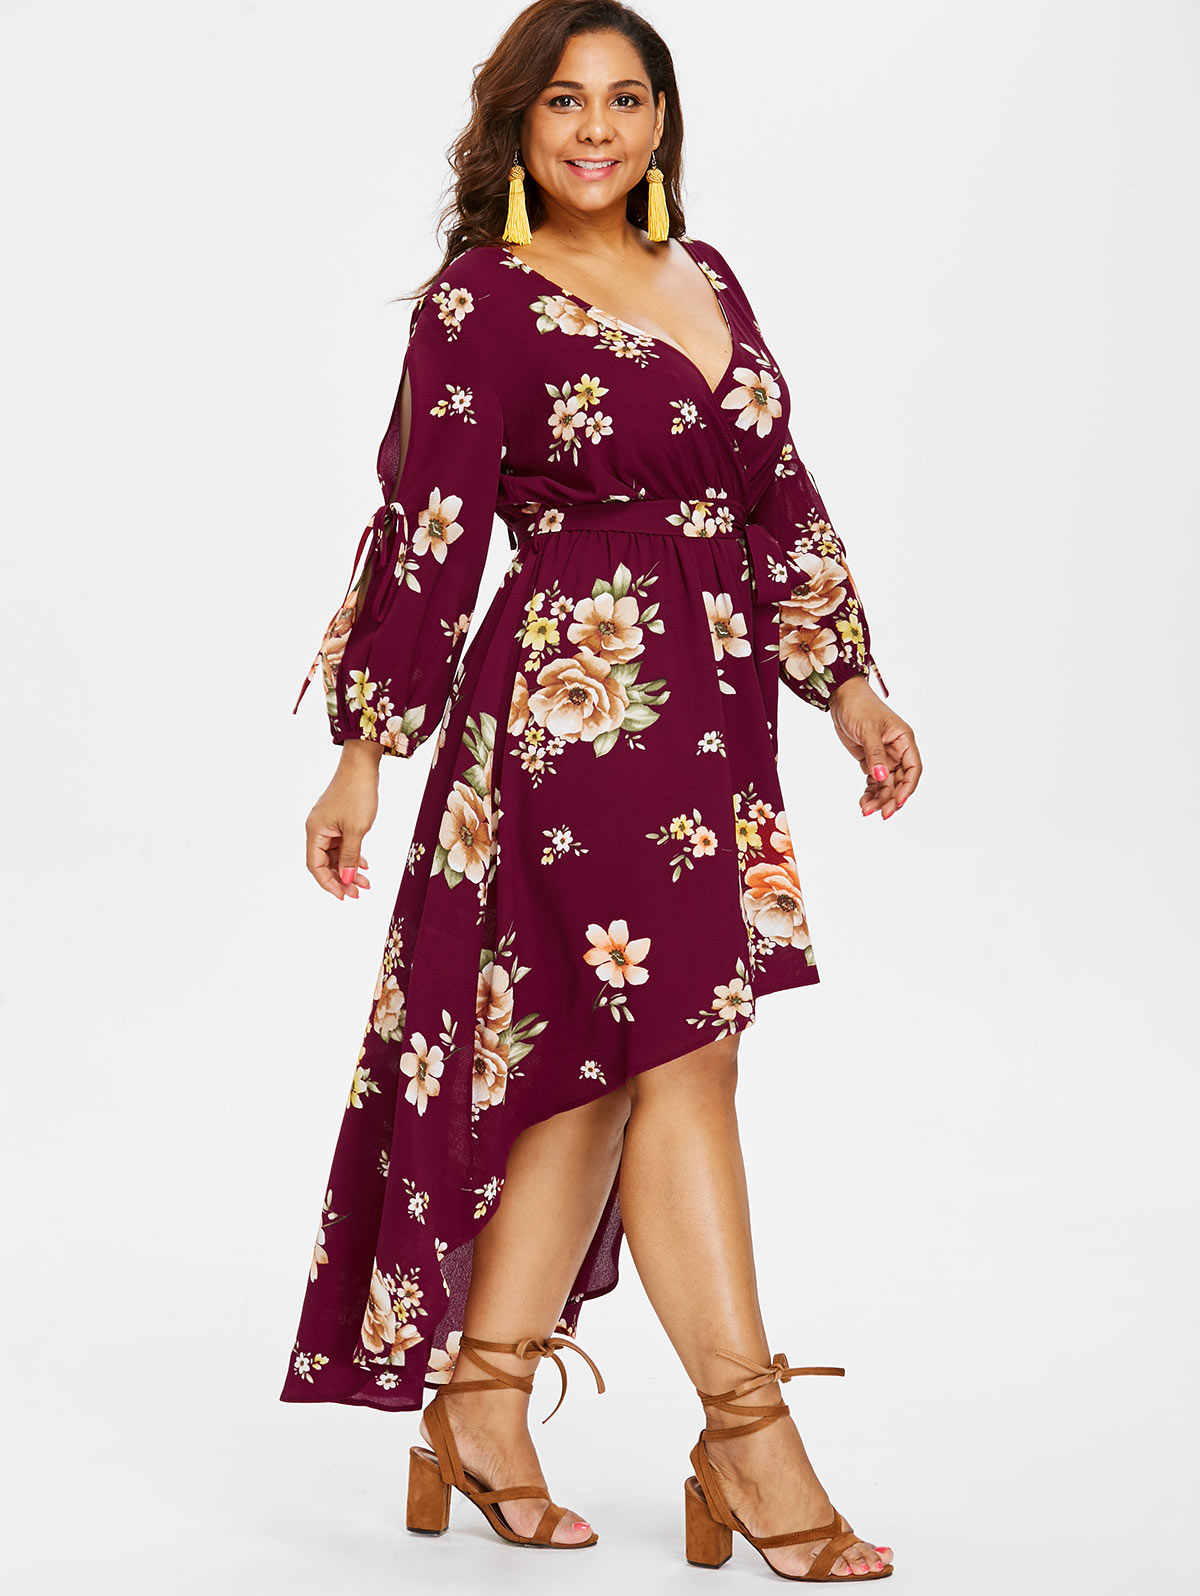 d05b0a5cfff0 ... Wipalo Plus Size Deep V-Neck Slit Sleeve Floral Maxi Dress Back Cut Out  Surplice ...